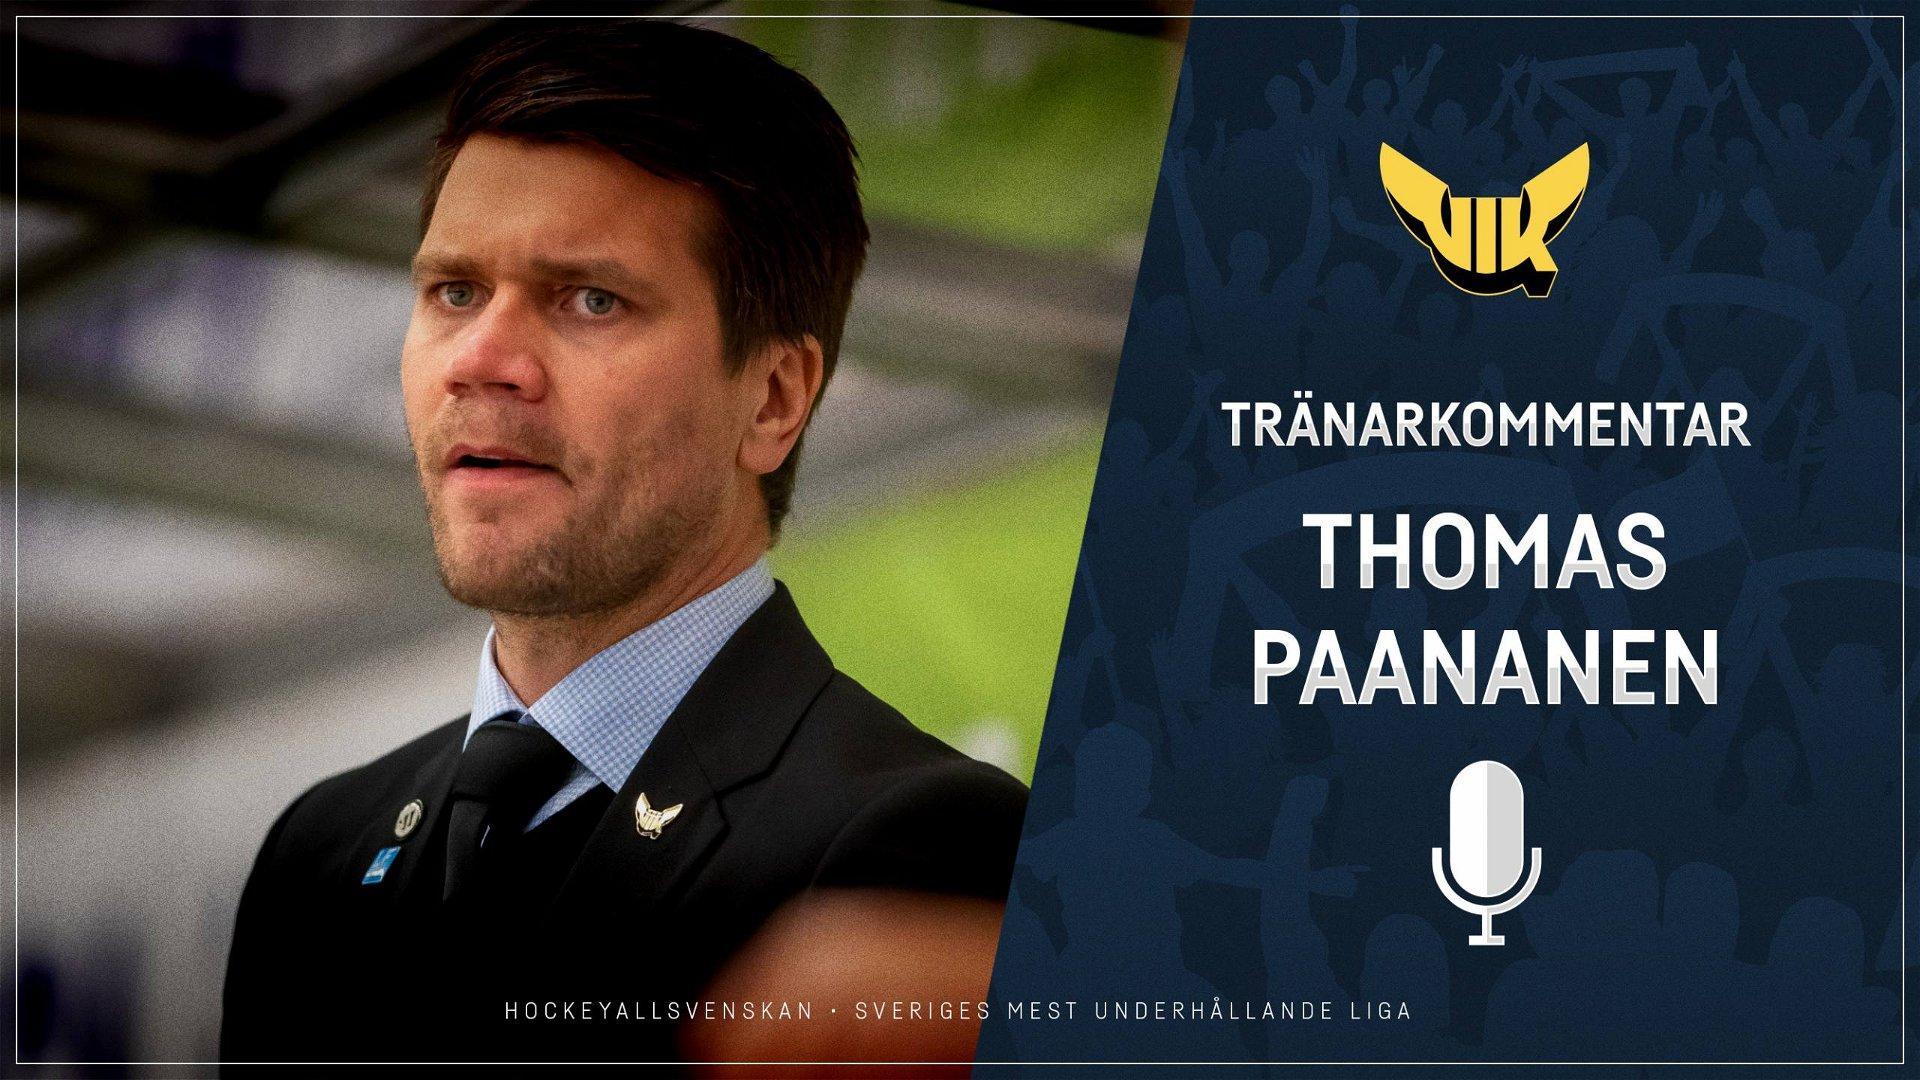 2020-10-28 Segerintervju: Thomas Paananen